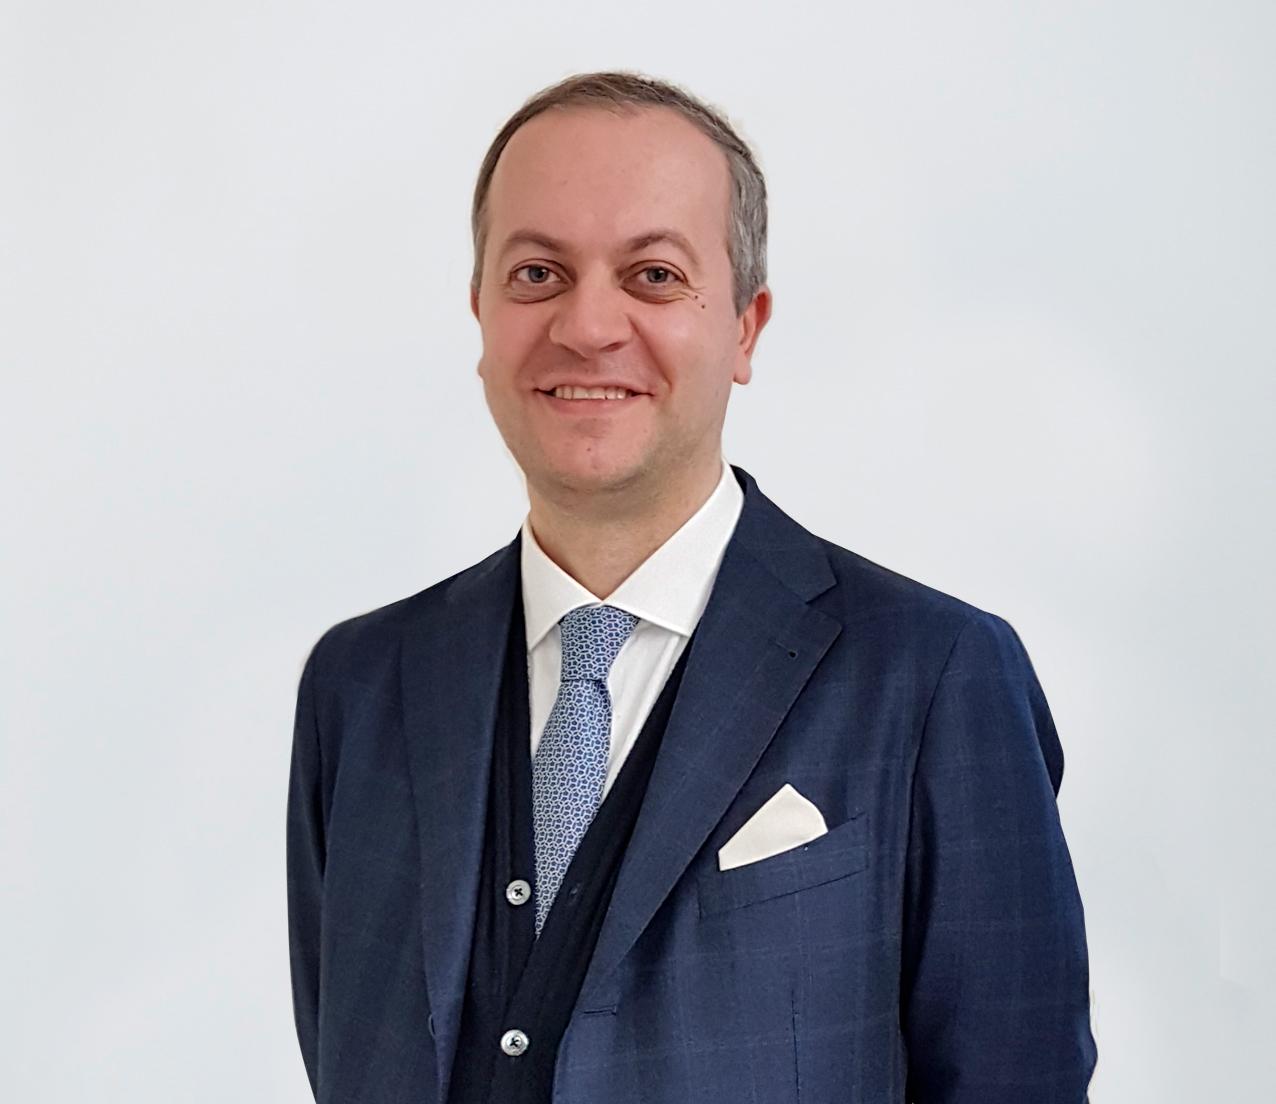 Mirko Lacchini